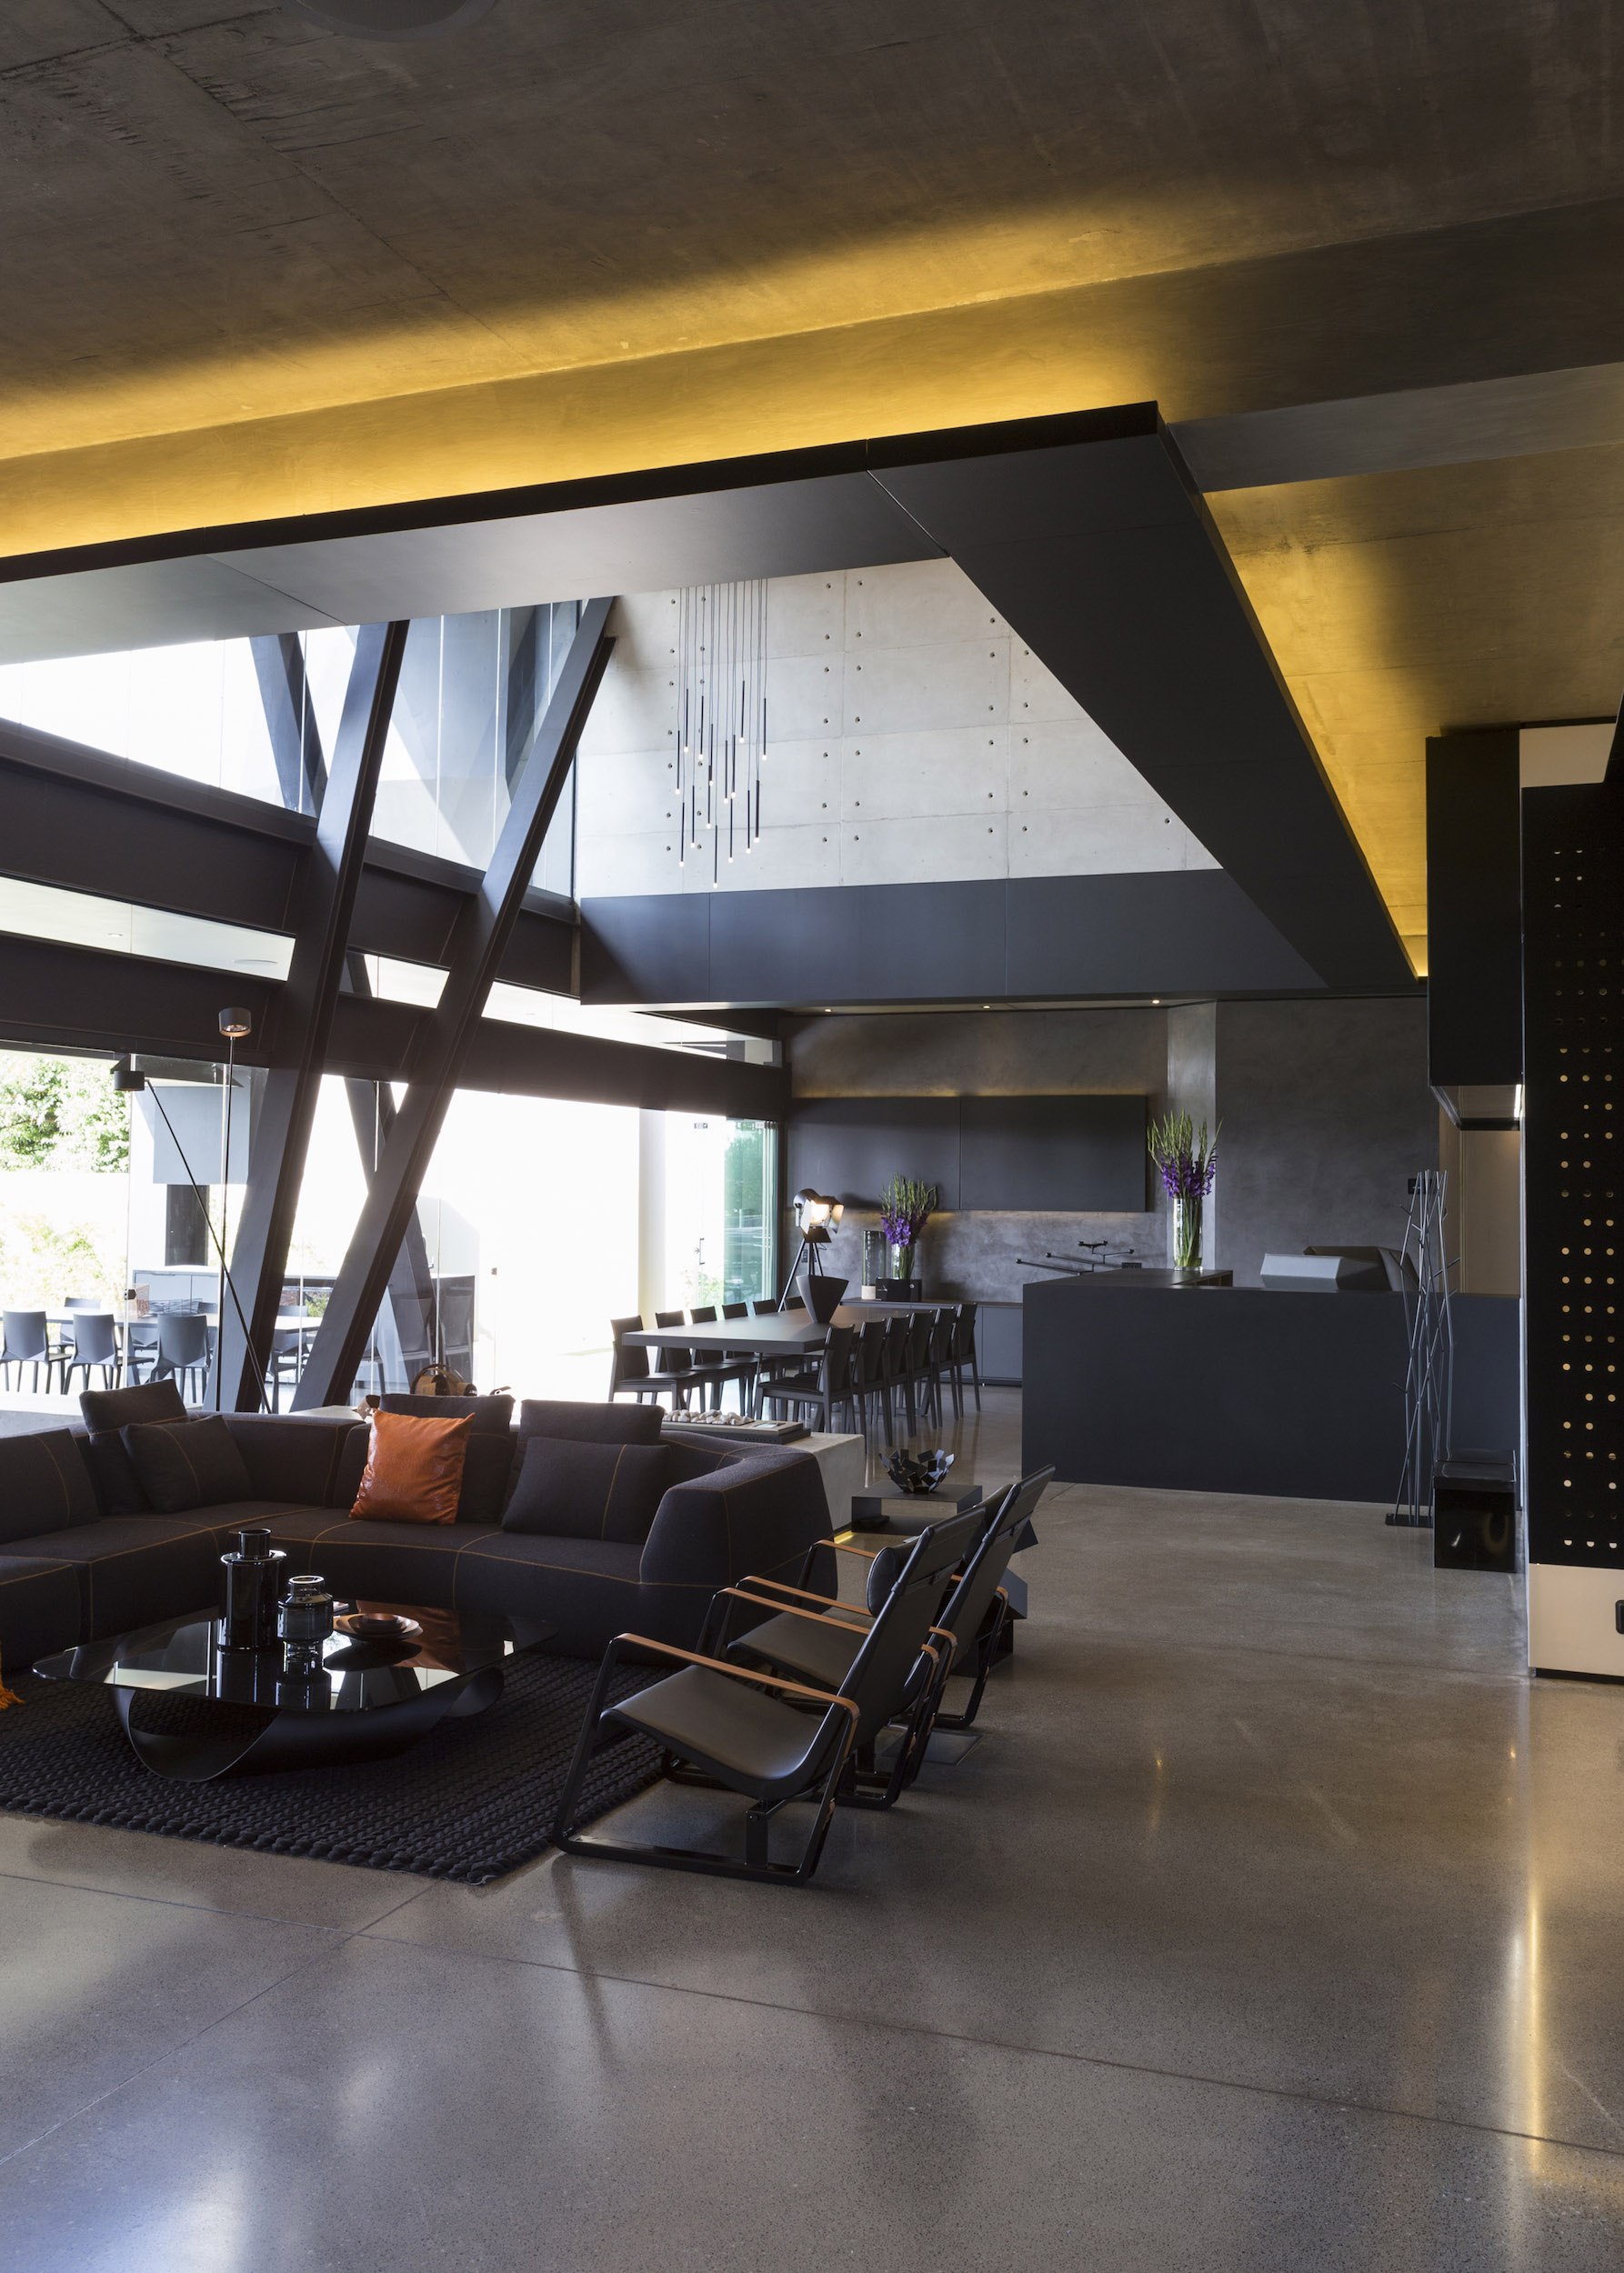 Kloof Road Masterpiece House in Johannesburg by Nico van der Meulen Architects-18